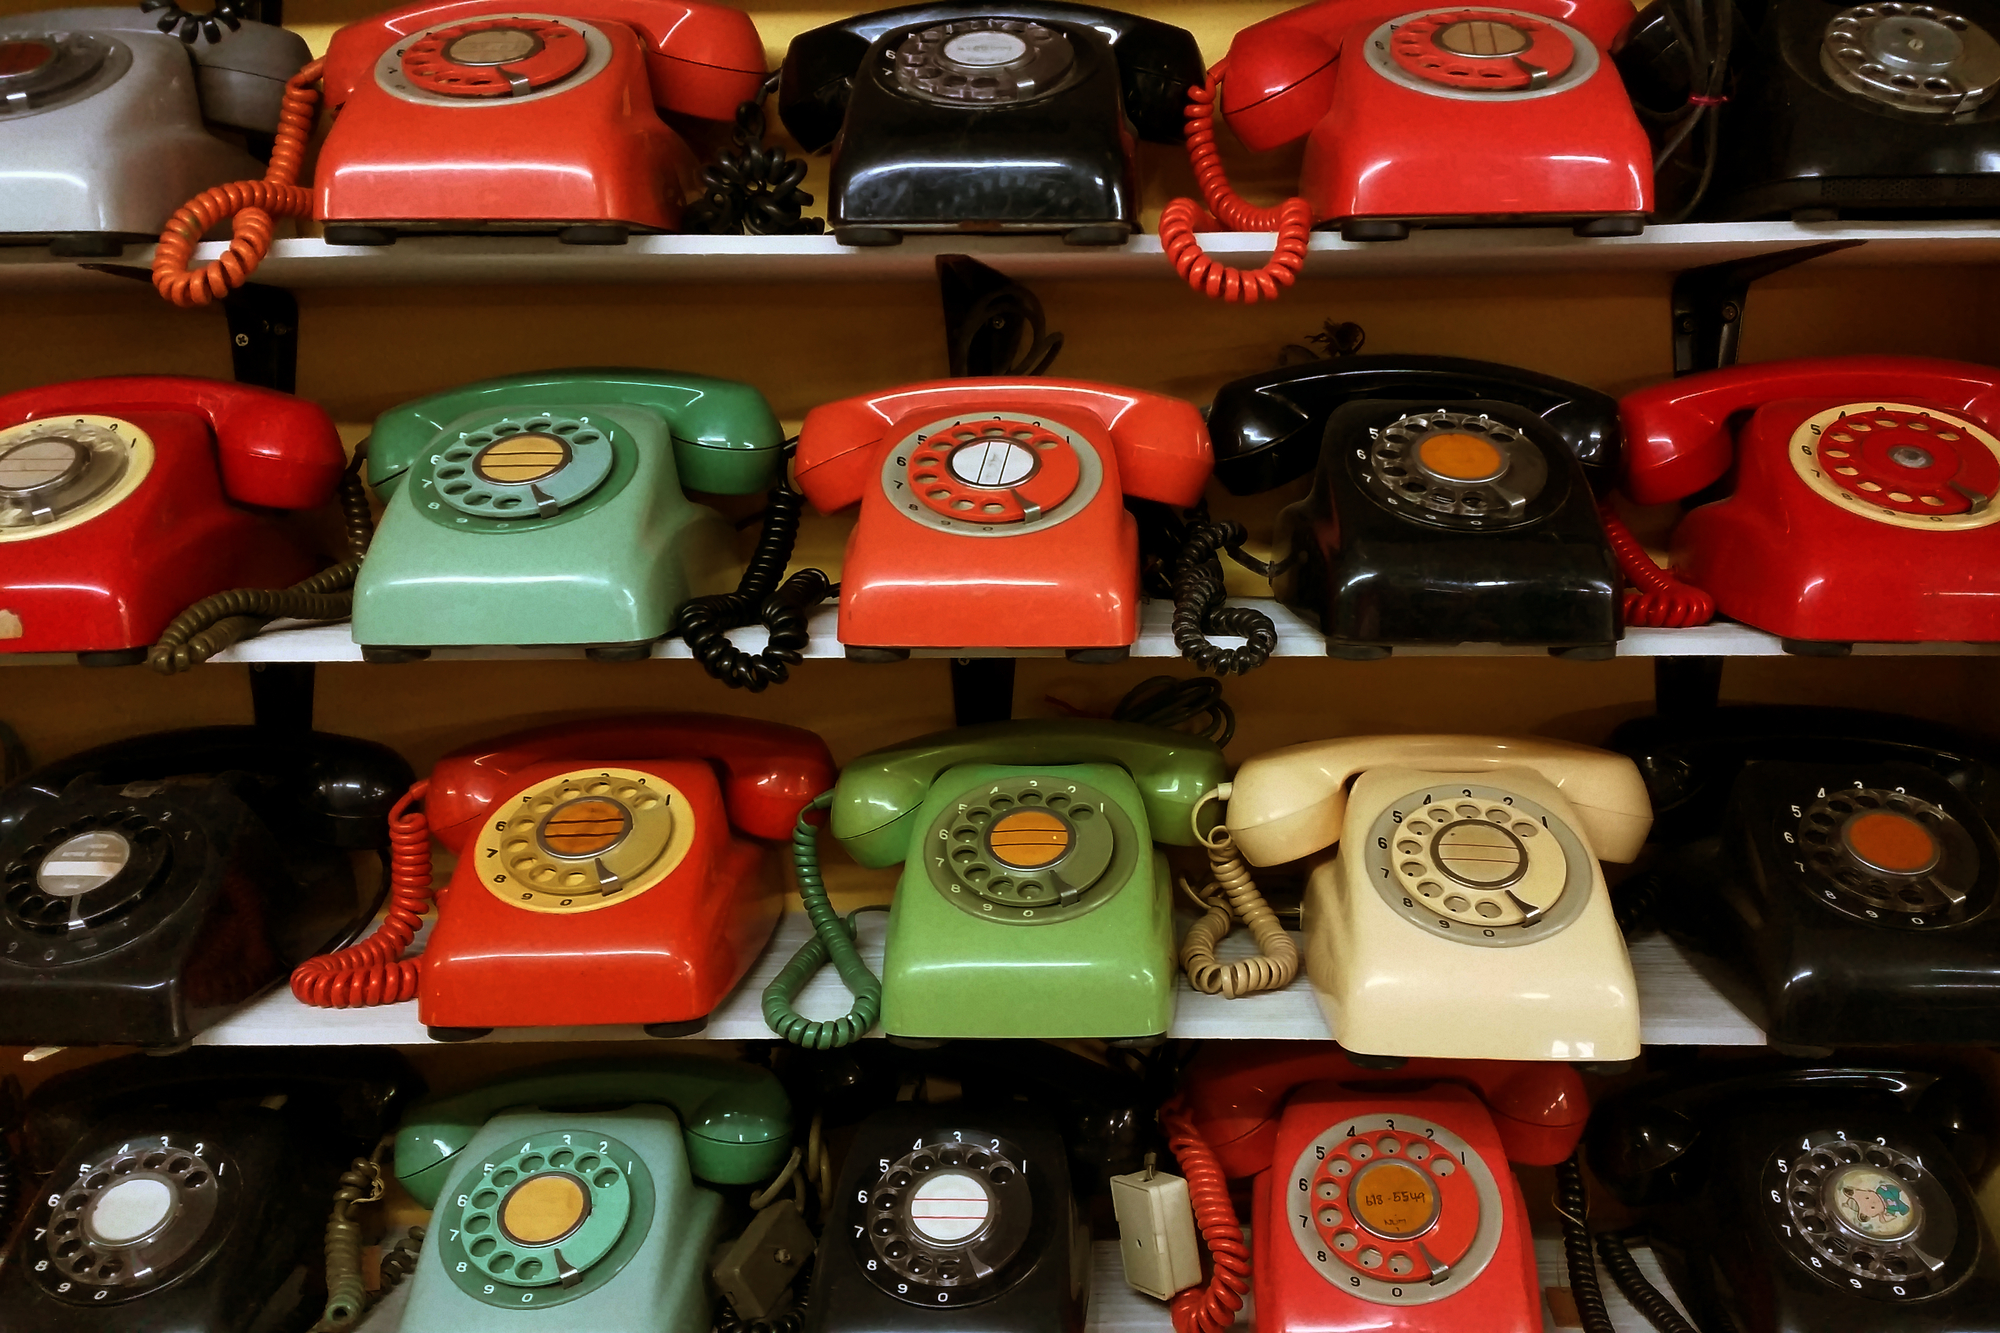 https://www.payperlead.com/wp-content/uploads/2020/07/paypercall-rotary-phones.jpg